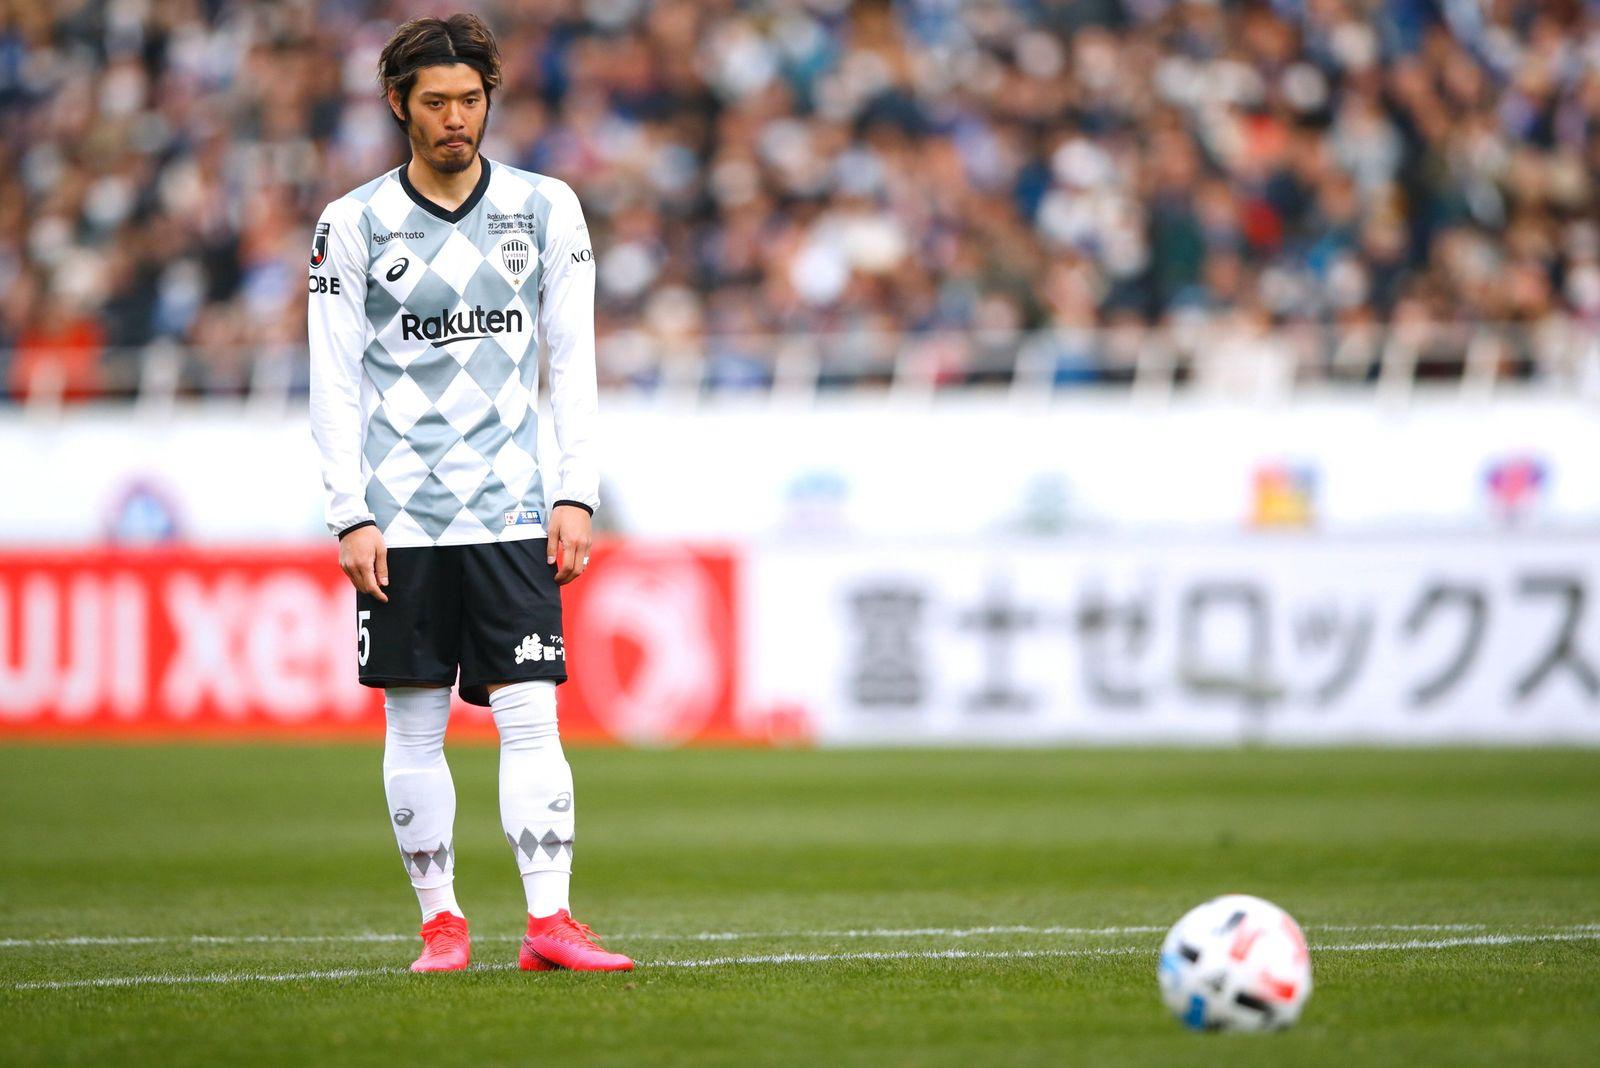 Hotaru Yamaguchi scores the winning penalty for Vissel Kobe during the Fuji Xerox Super Cup 2020 football championship